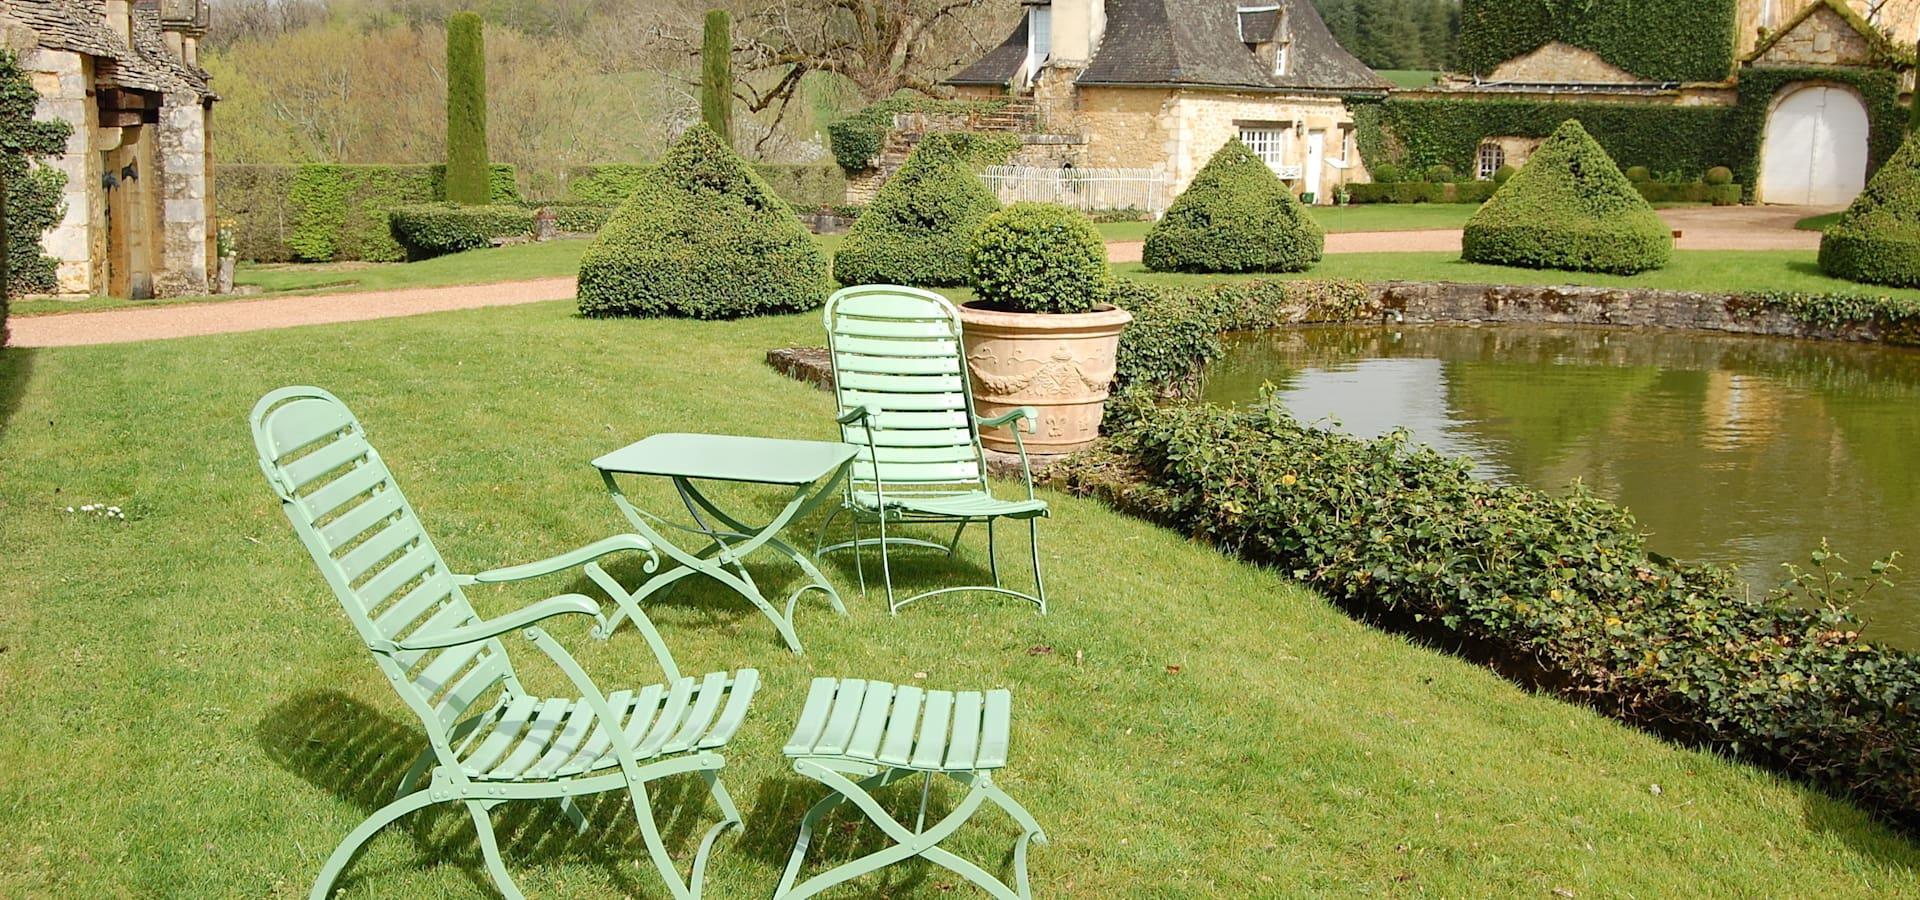 Meubles De Jardin Potier: Fauteuil Akebia | Homify serapportantà Fauteuille De Jardin